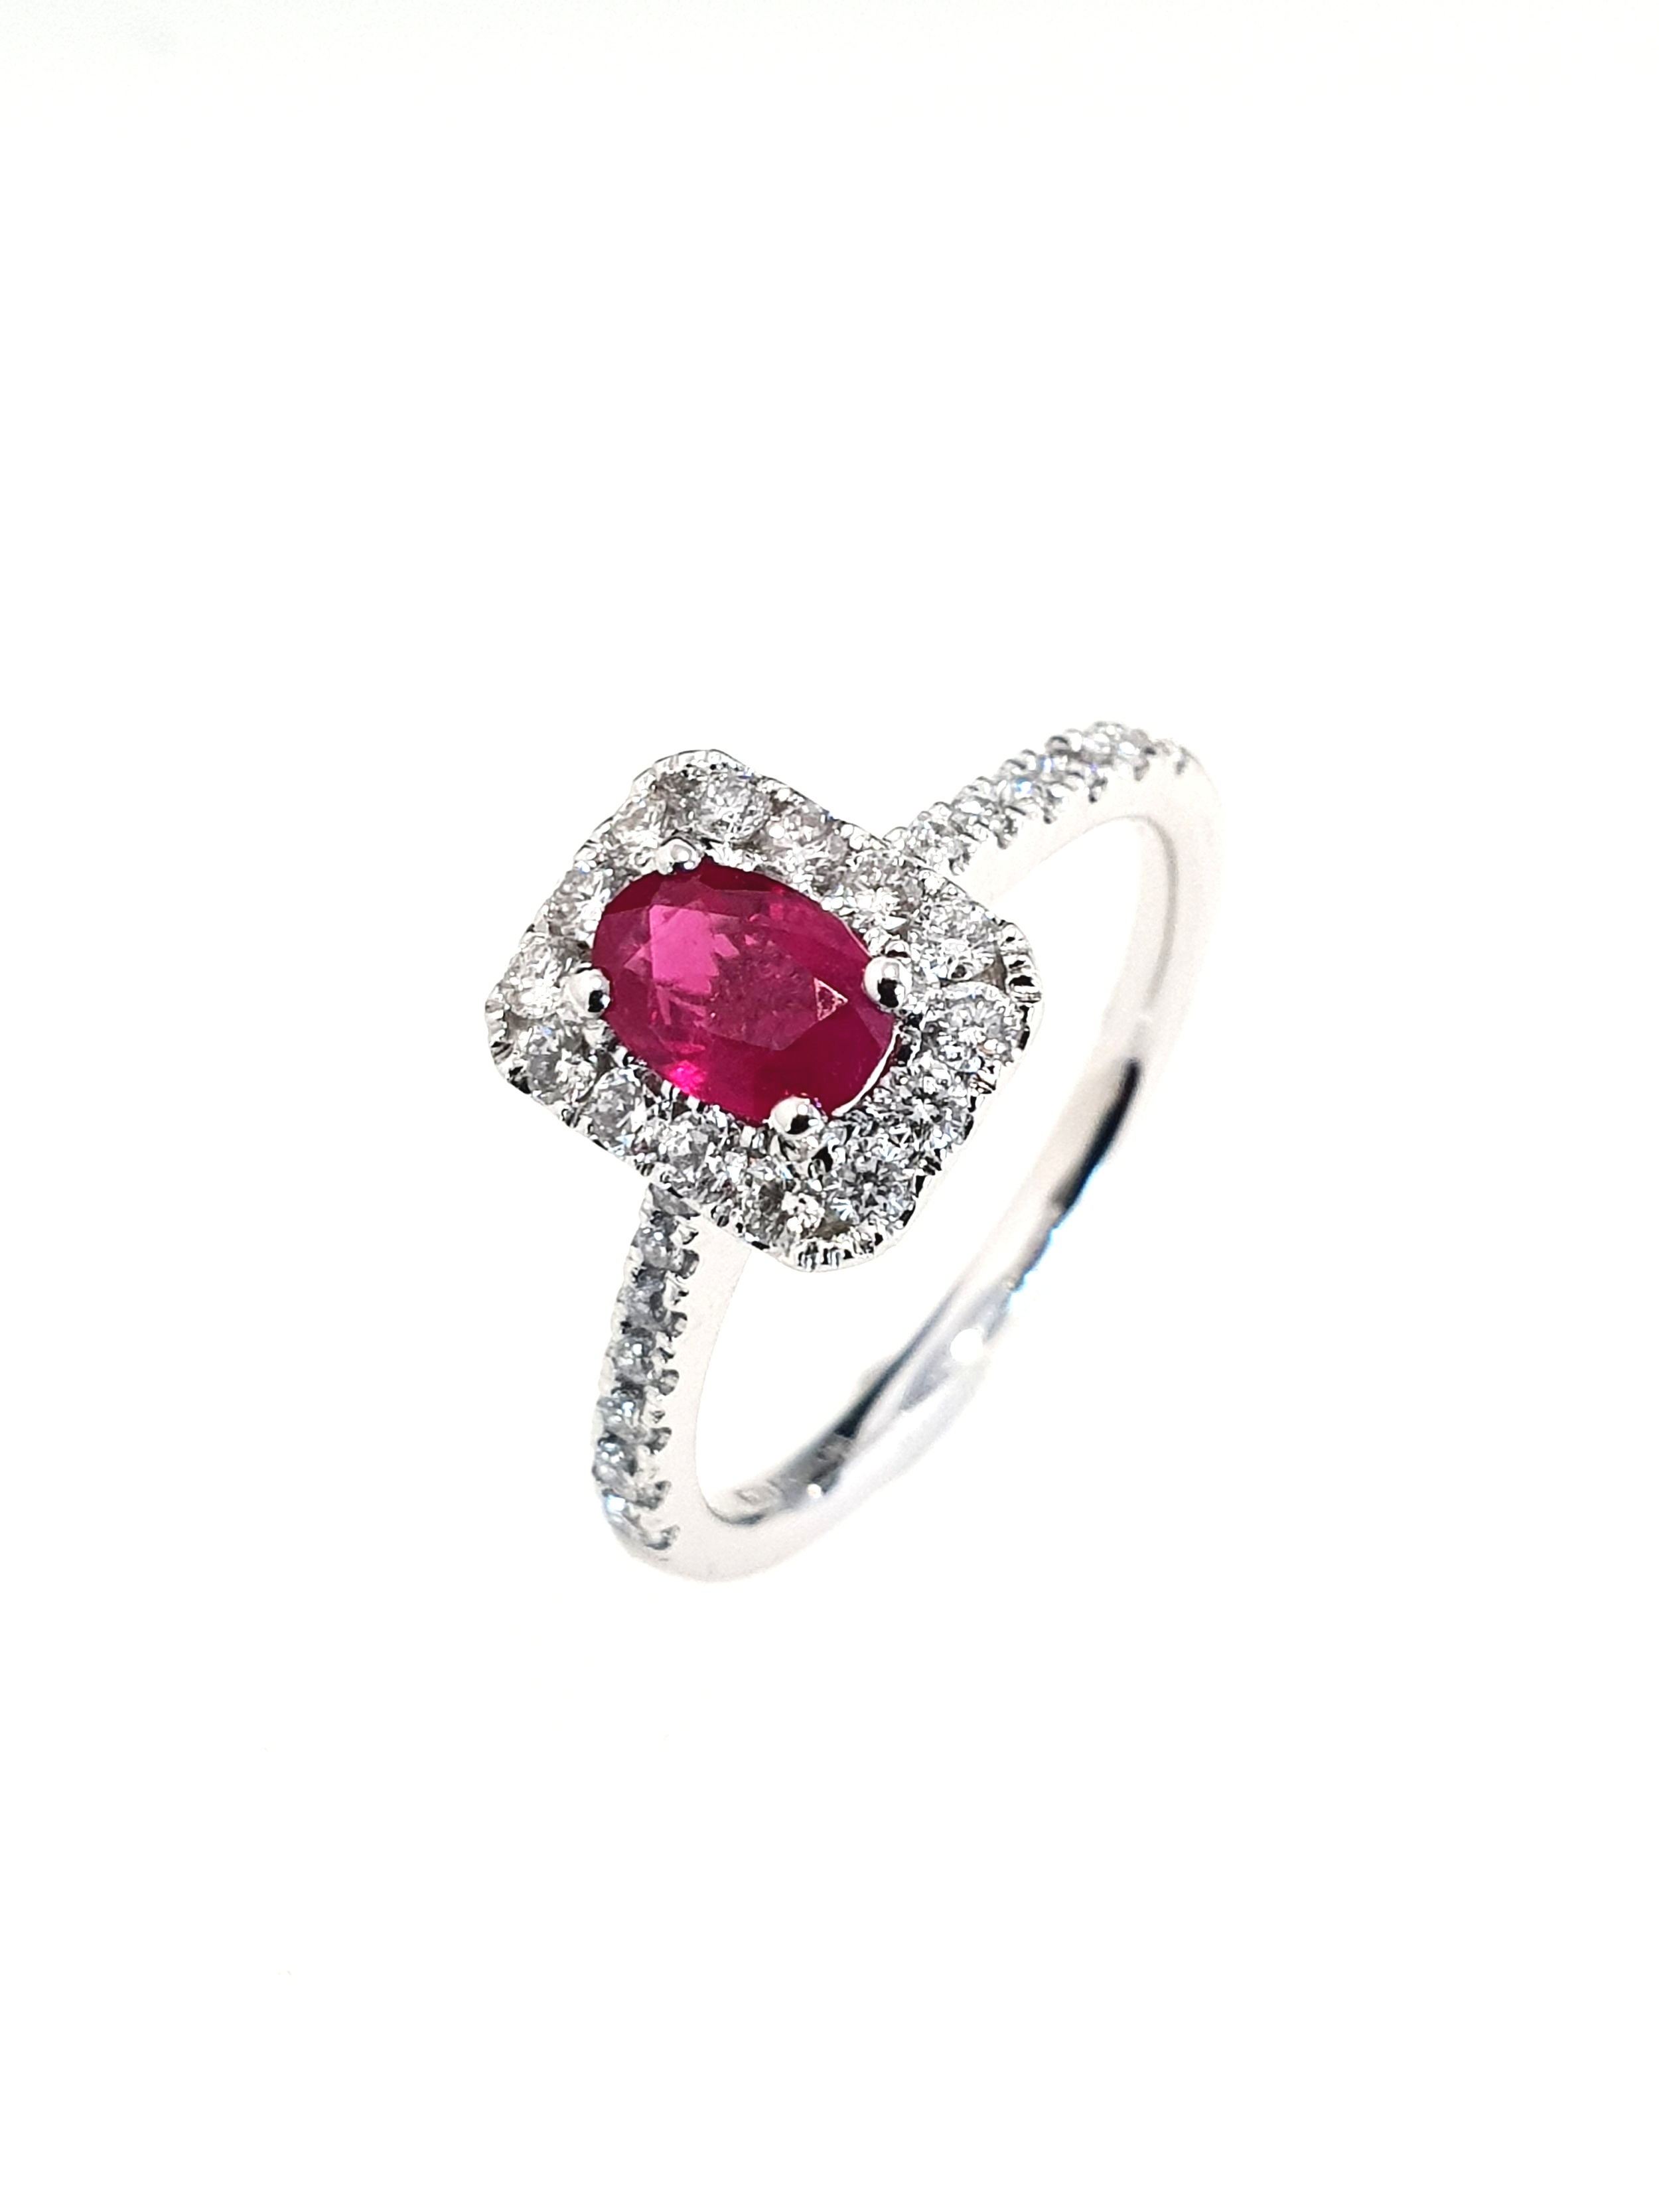 18ct White Gold Ruby(.55ct) & Diamond Ring  Diamond: .37ct, G, Si1  Stock Code: N8950  £1650